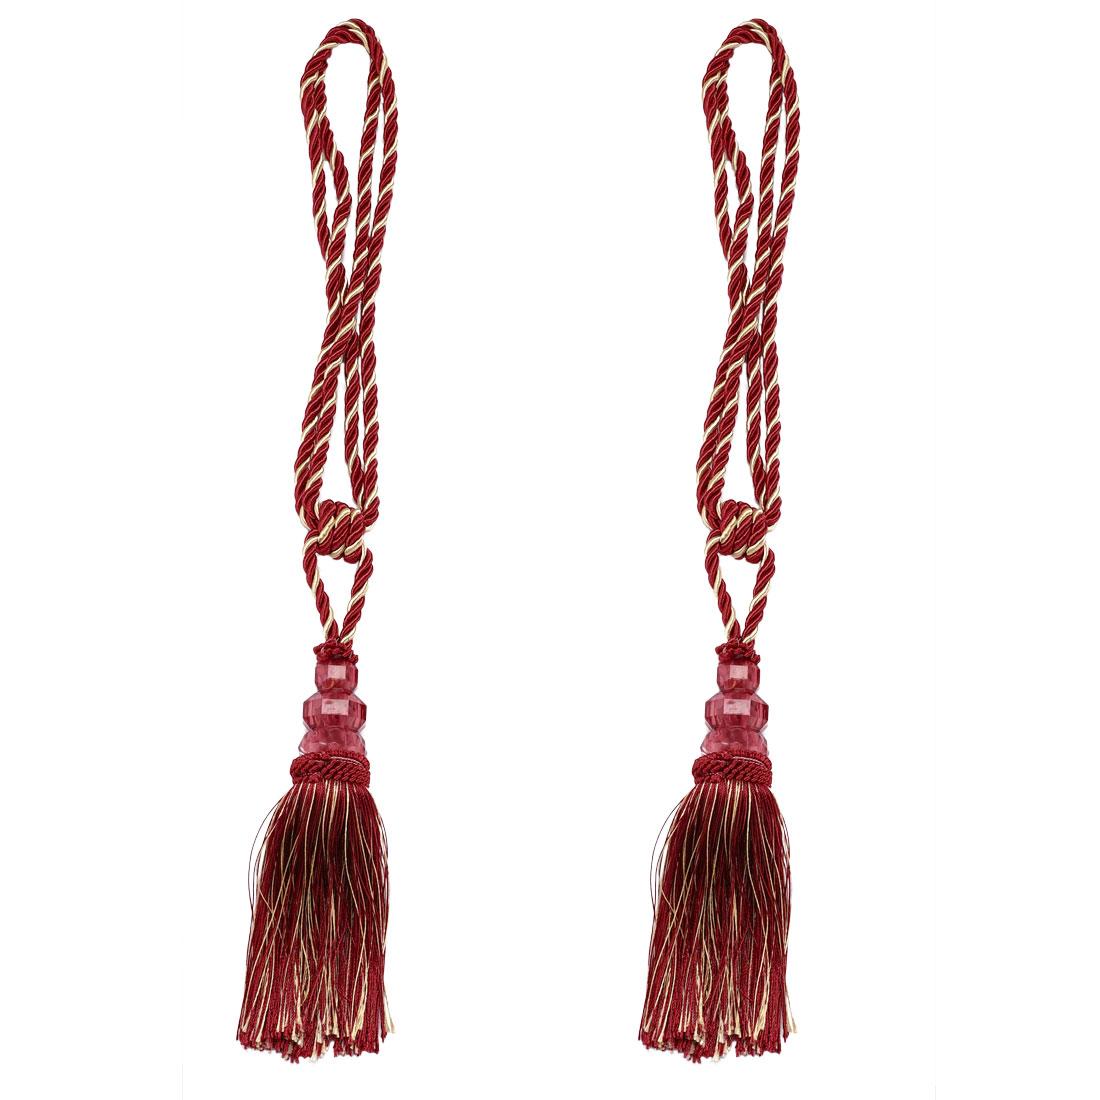 Curtain Tiebacks Holdback w Hooks Braid Rope Tessal 2 Set Copper Tone + Burgundy